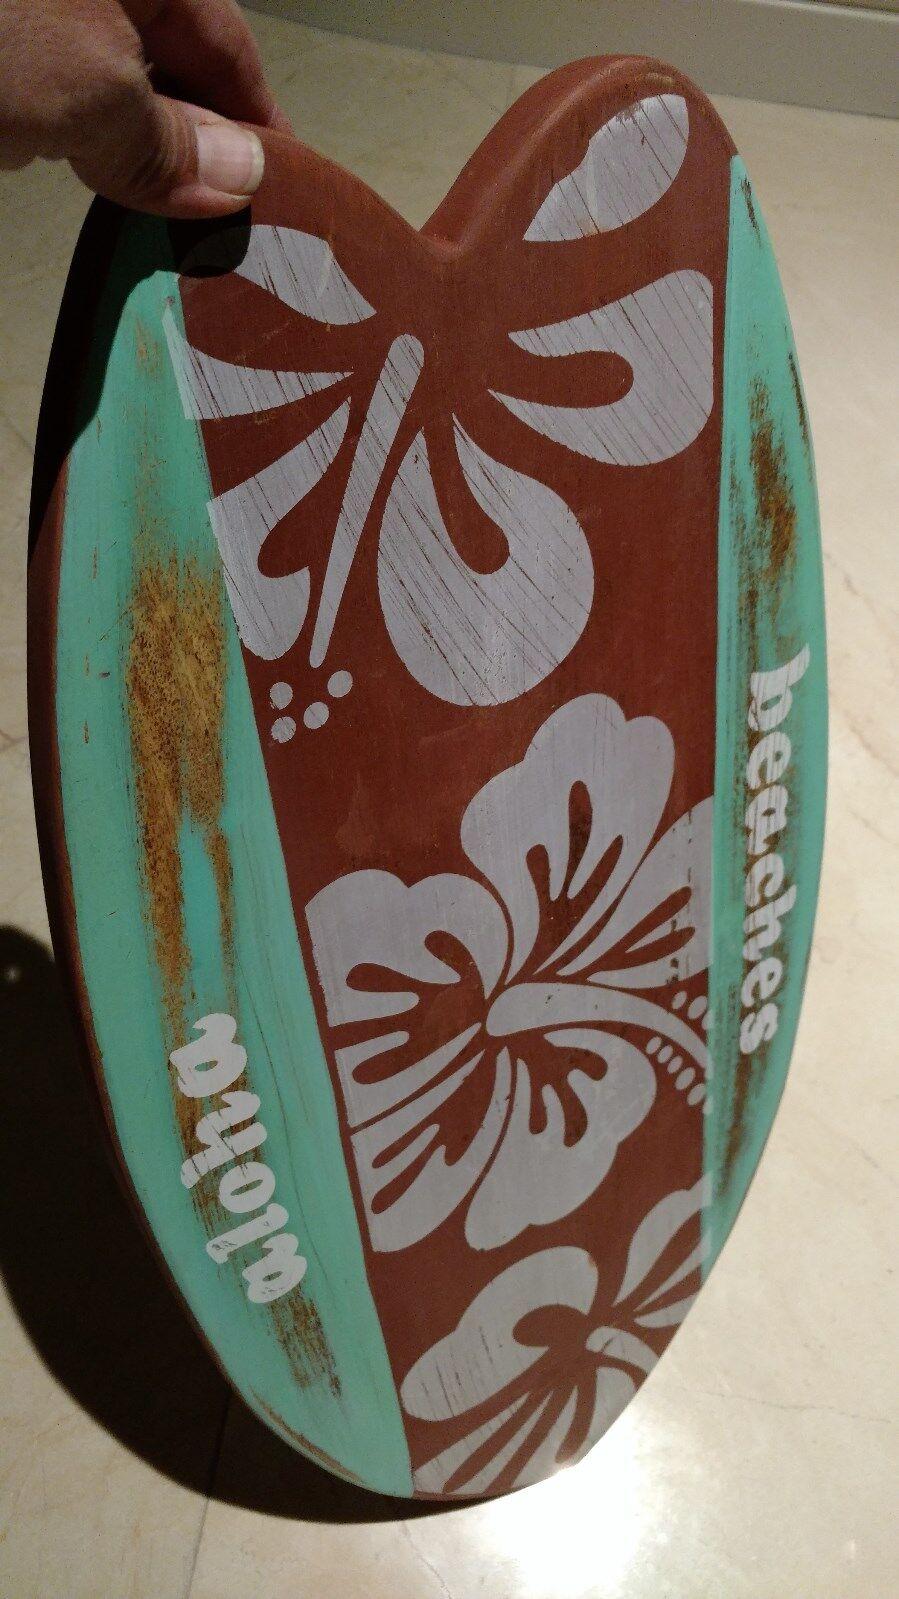 Margaritaville Aloha cheeseboard 5 Grand Hawaii peint à la main NEW EXTRA LARGE 23